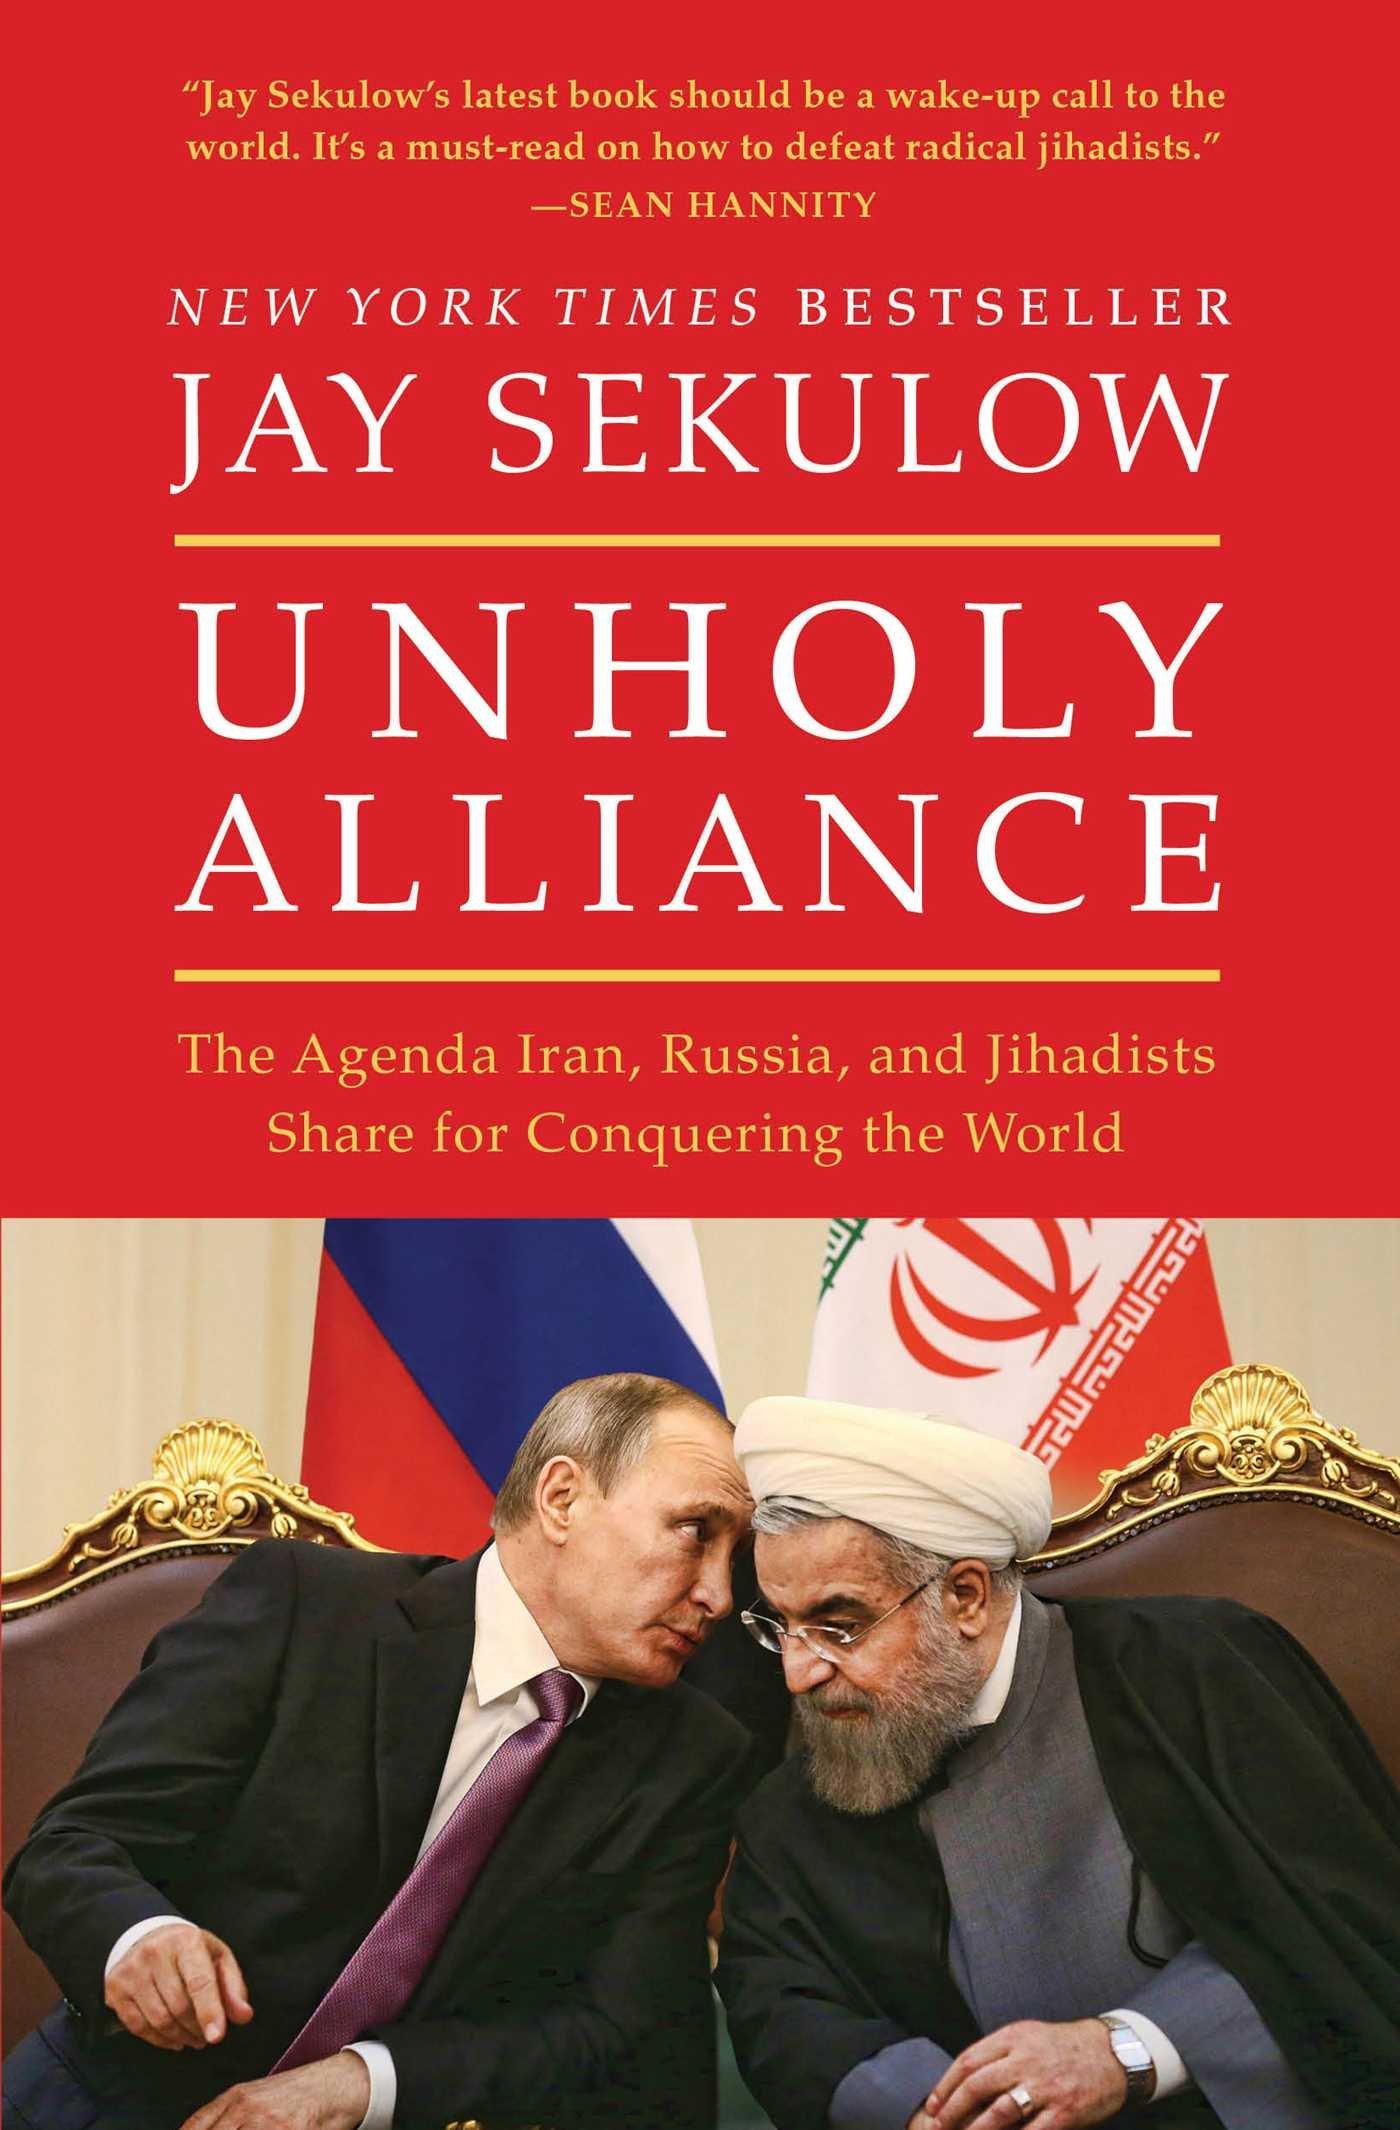 Unholy Alliance: The Agenda Iran, Russia, and Jihadists Share for  Conquering the World: Jay Sekulow: 9781501141461: Amazon.com: Books